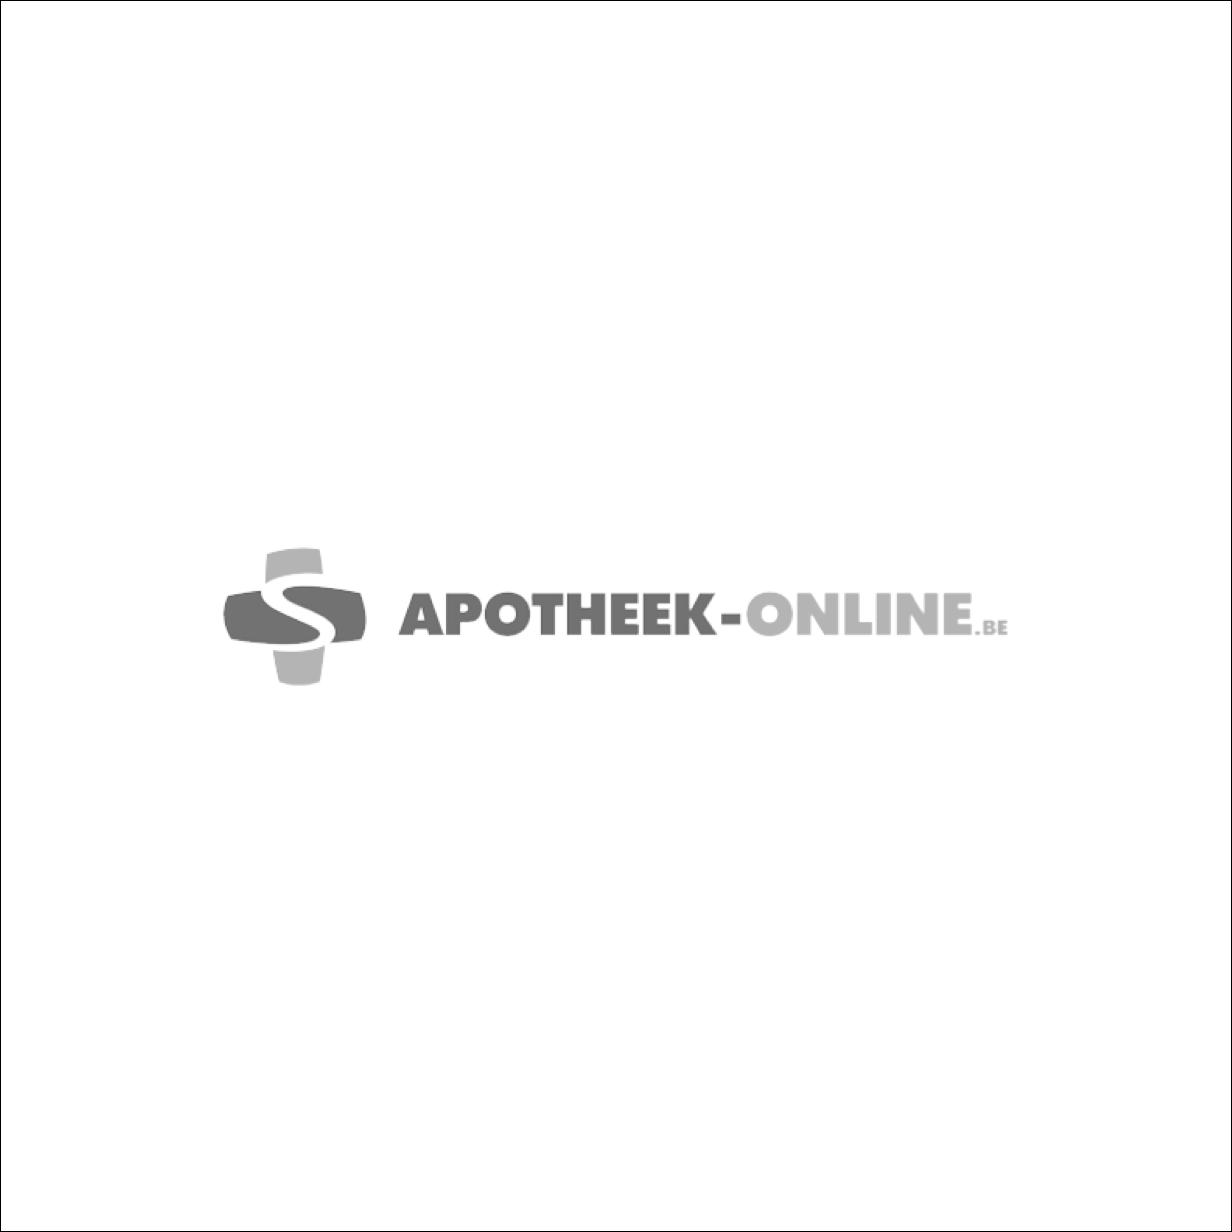 GAZIN KP N/STER 12P 7,5X 7,5CM 100 18504